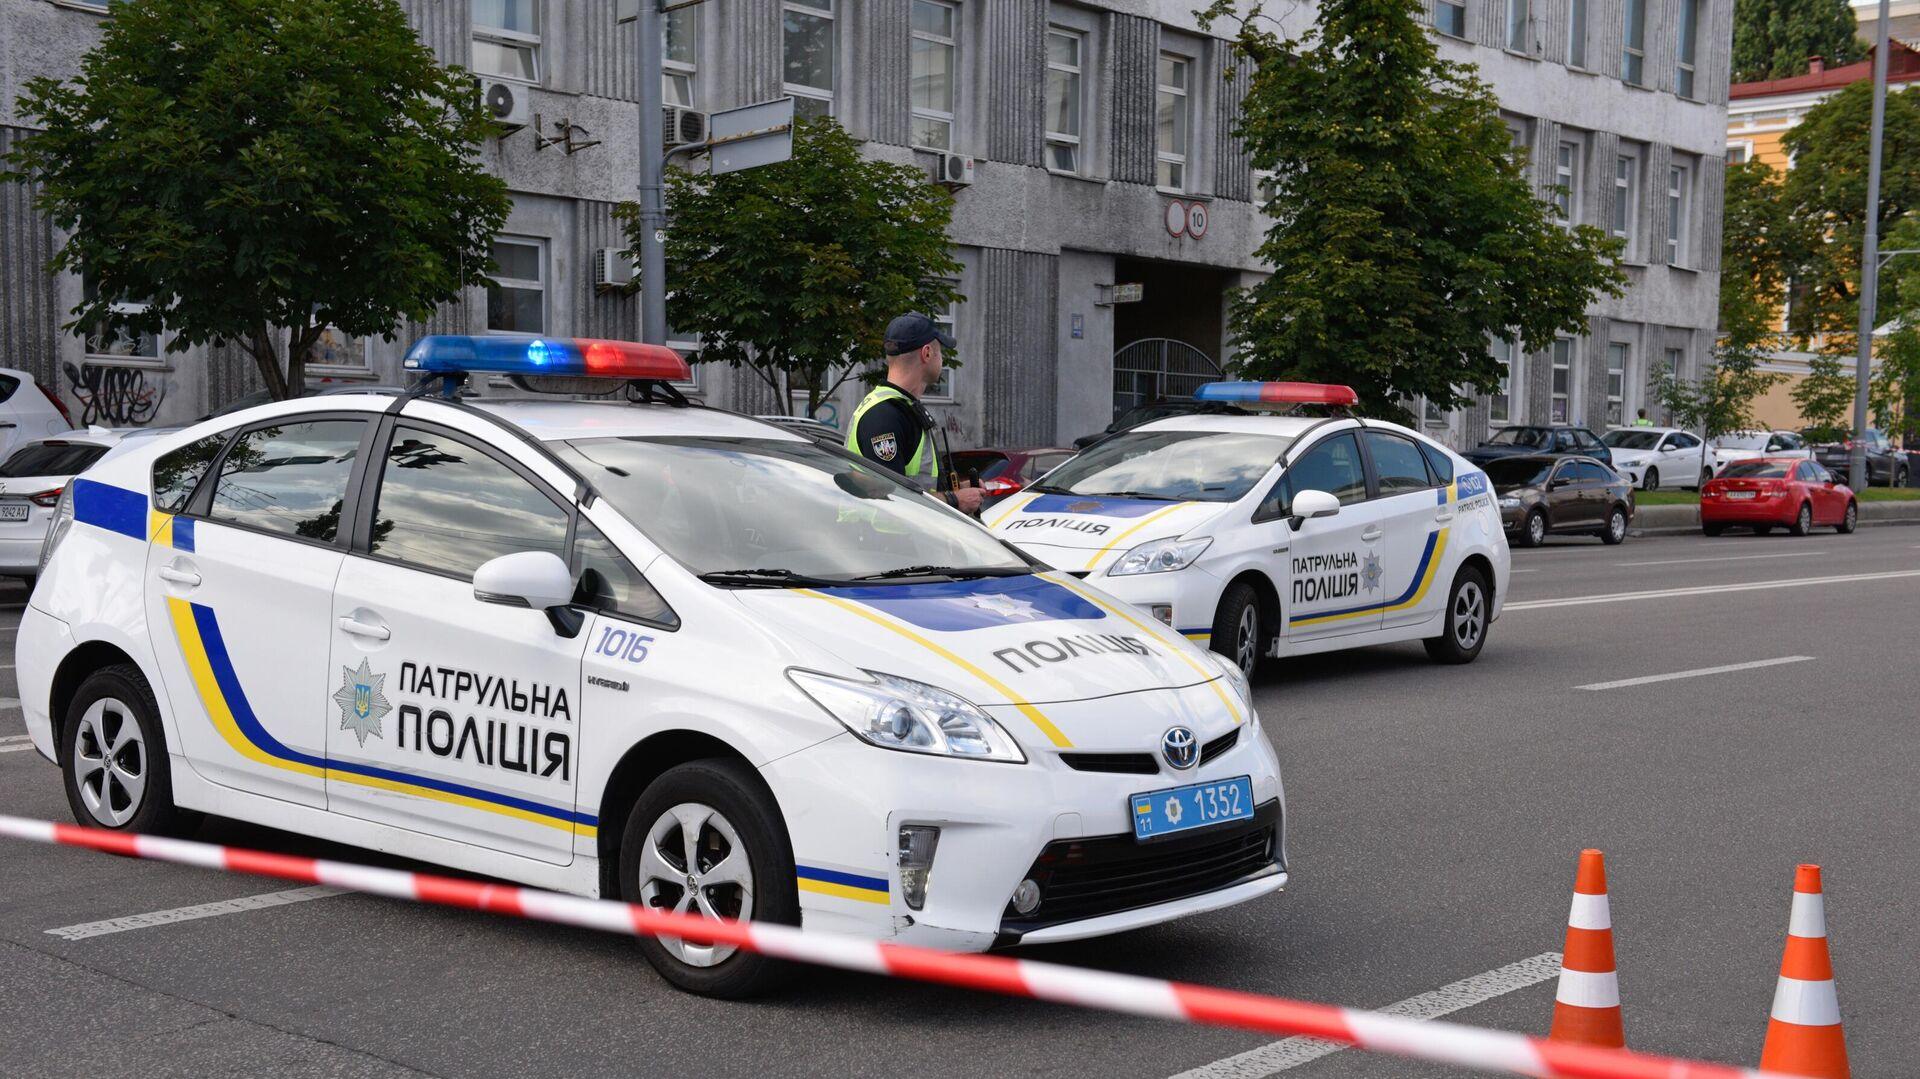 Машина полиции на Украине - РИА Новости, 1920, 24.08.2020